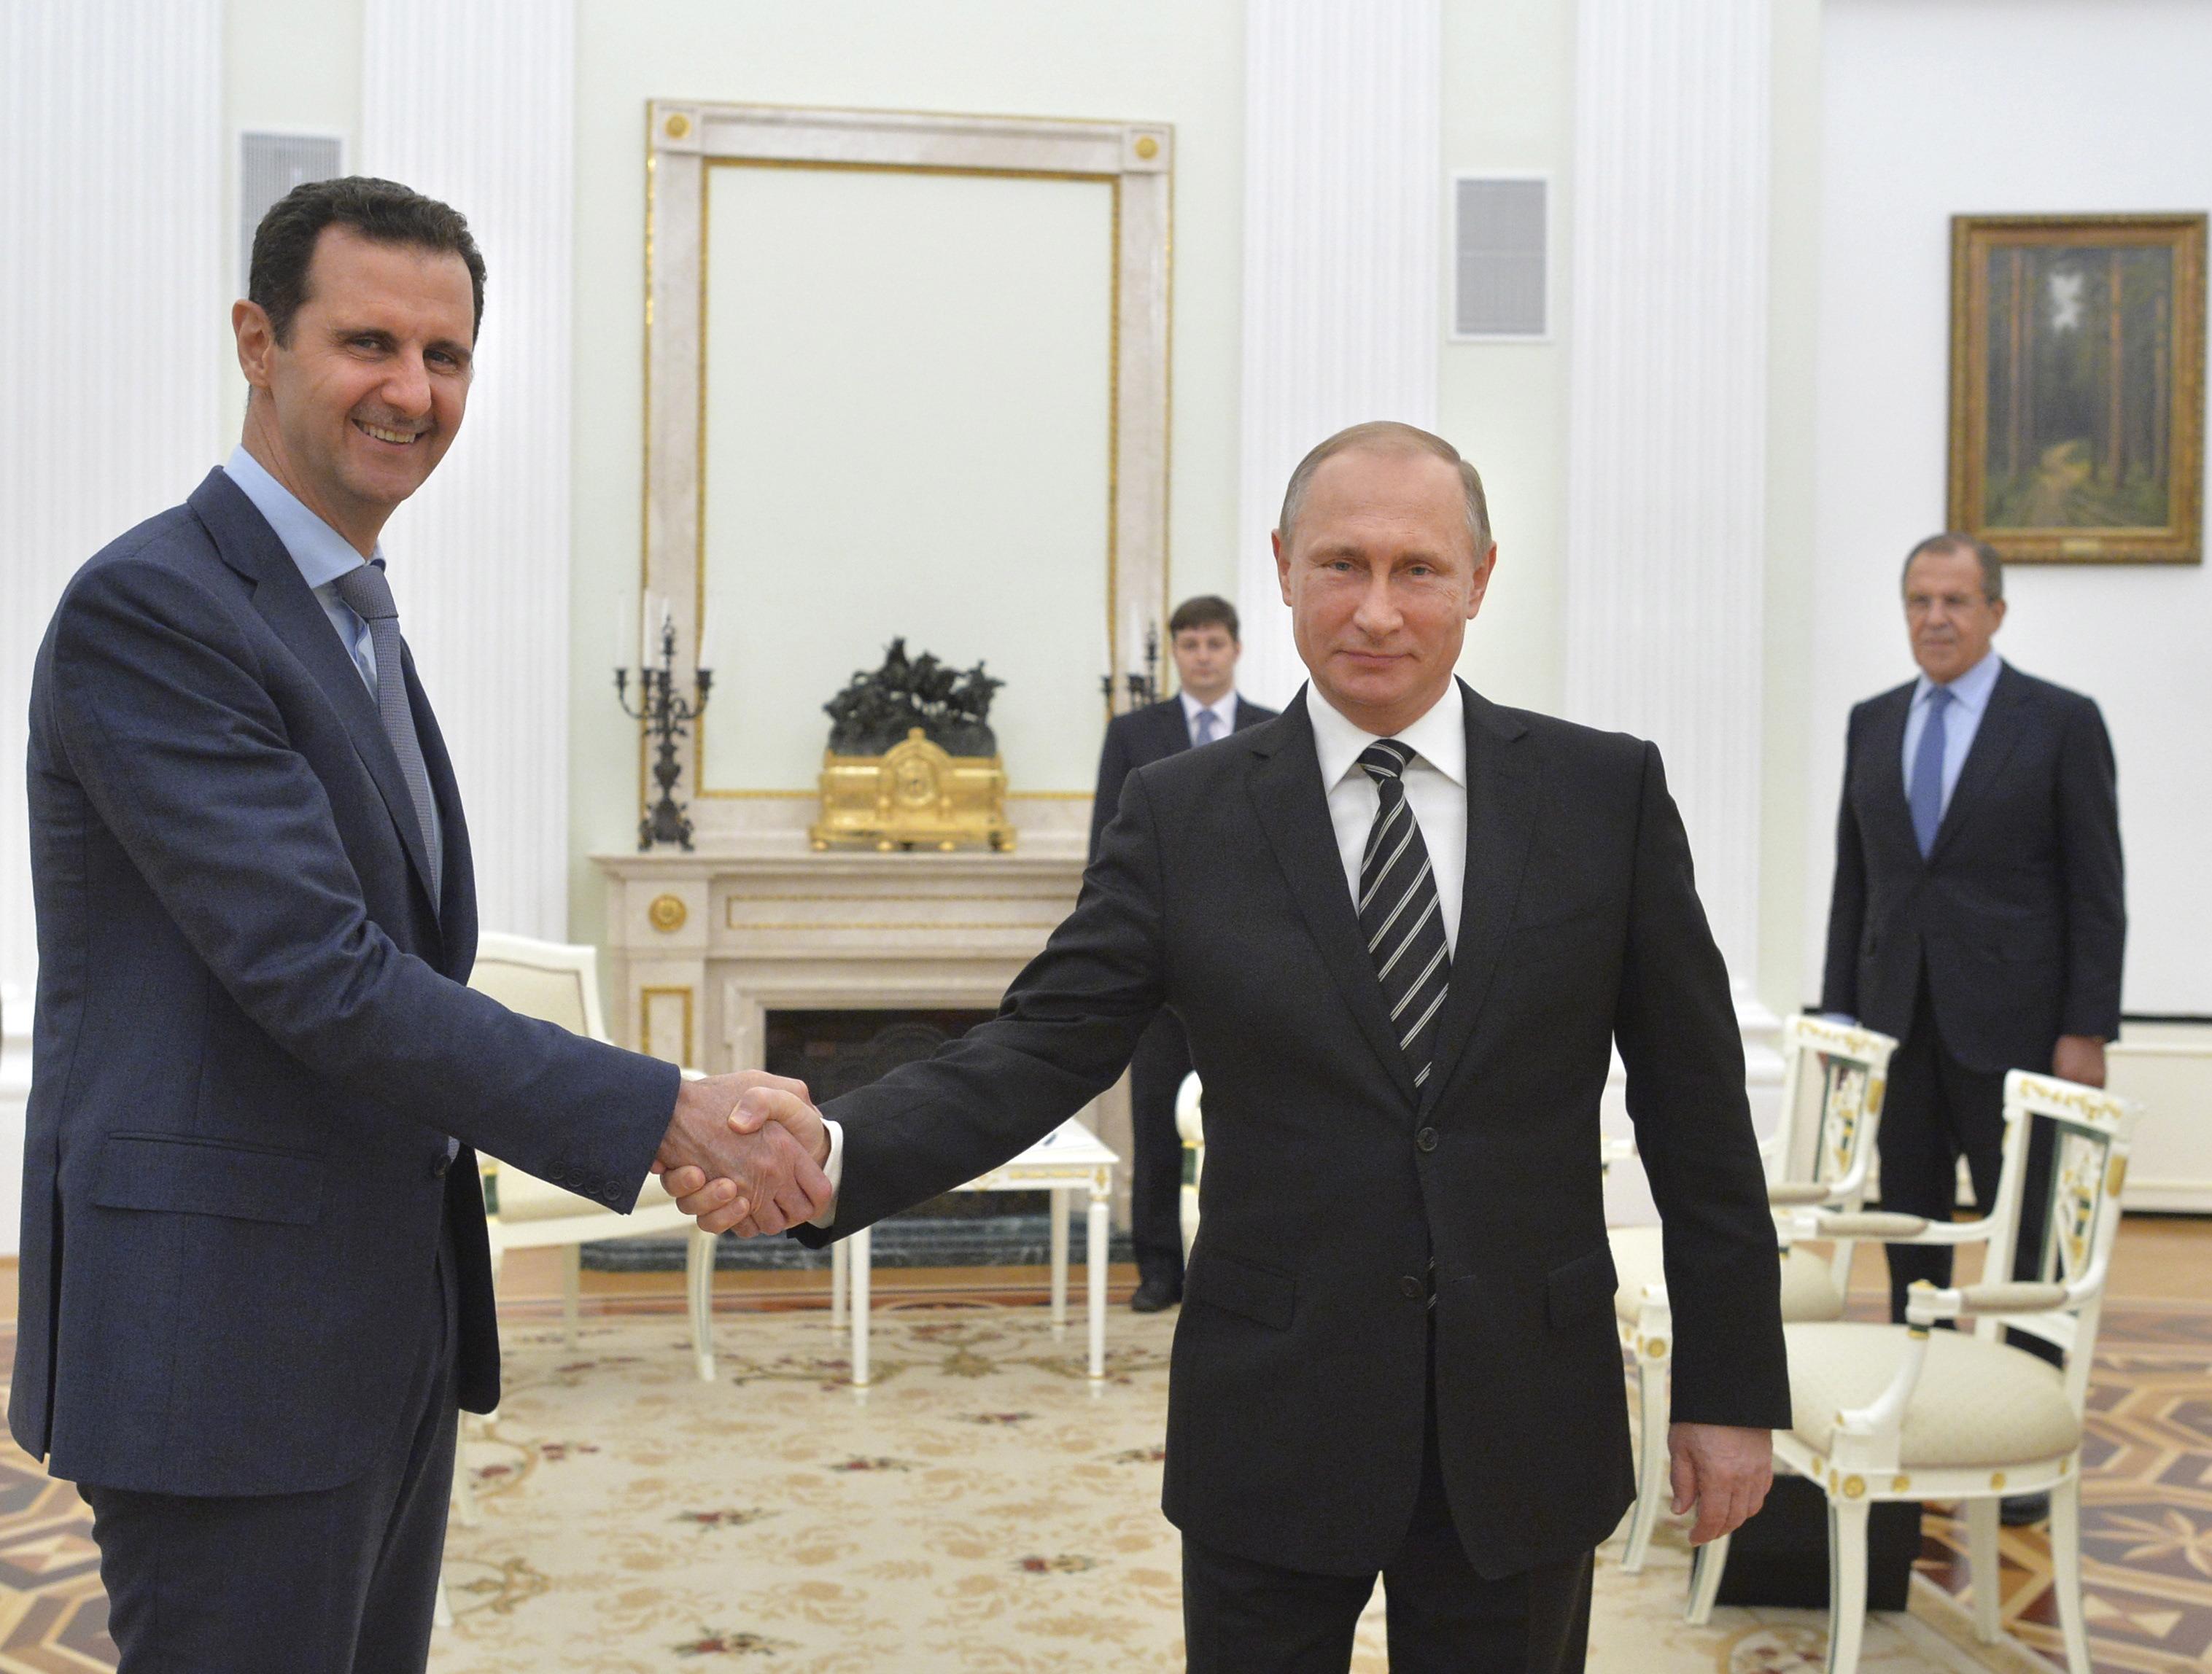 Russian President Vladimir Putin and Syrian President Bashar al-Assad meet at the Kremlin in Moscow, Russia.